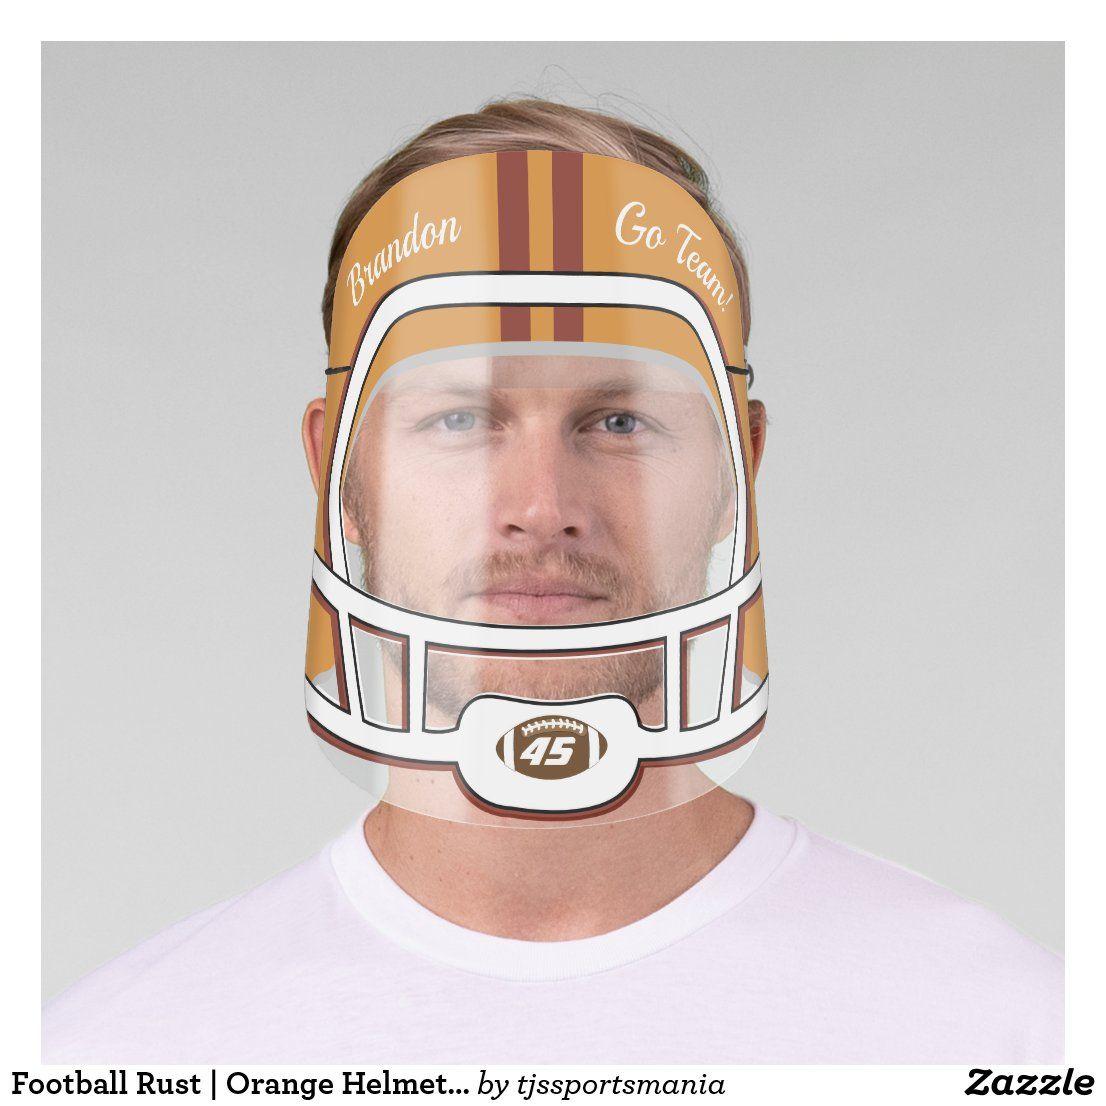 Football rust orange helmet name team number face shield